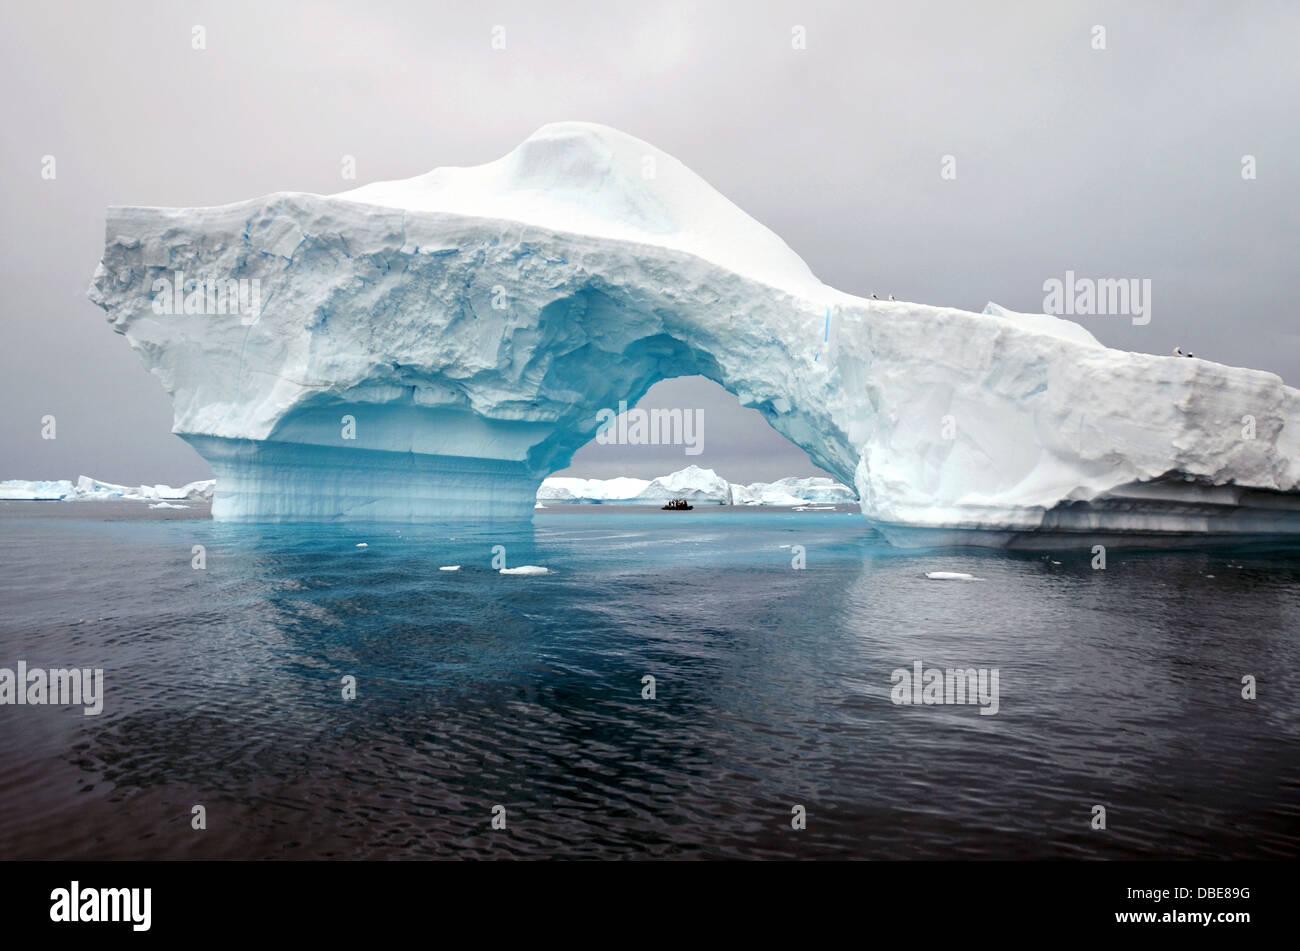 A zodiac boat cruises through an opening in a beautiful ice berg near Pleneau Islands, Antarctica - Stock Image